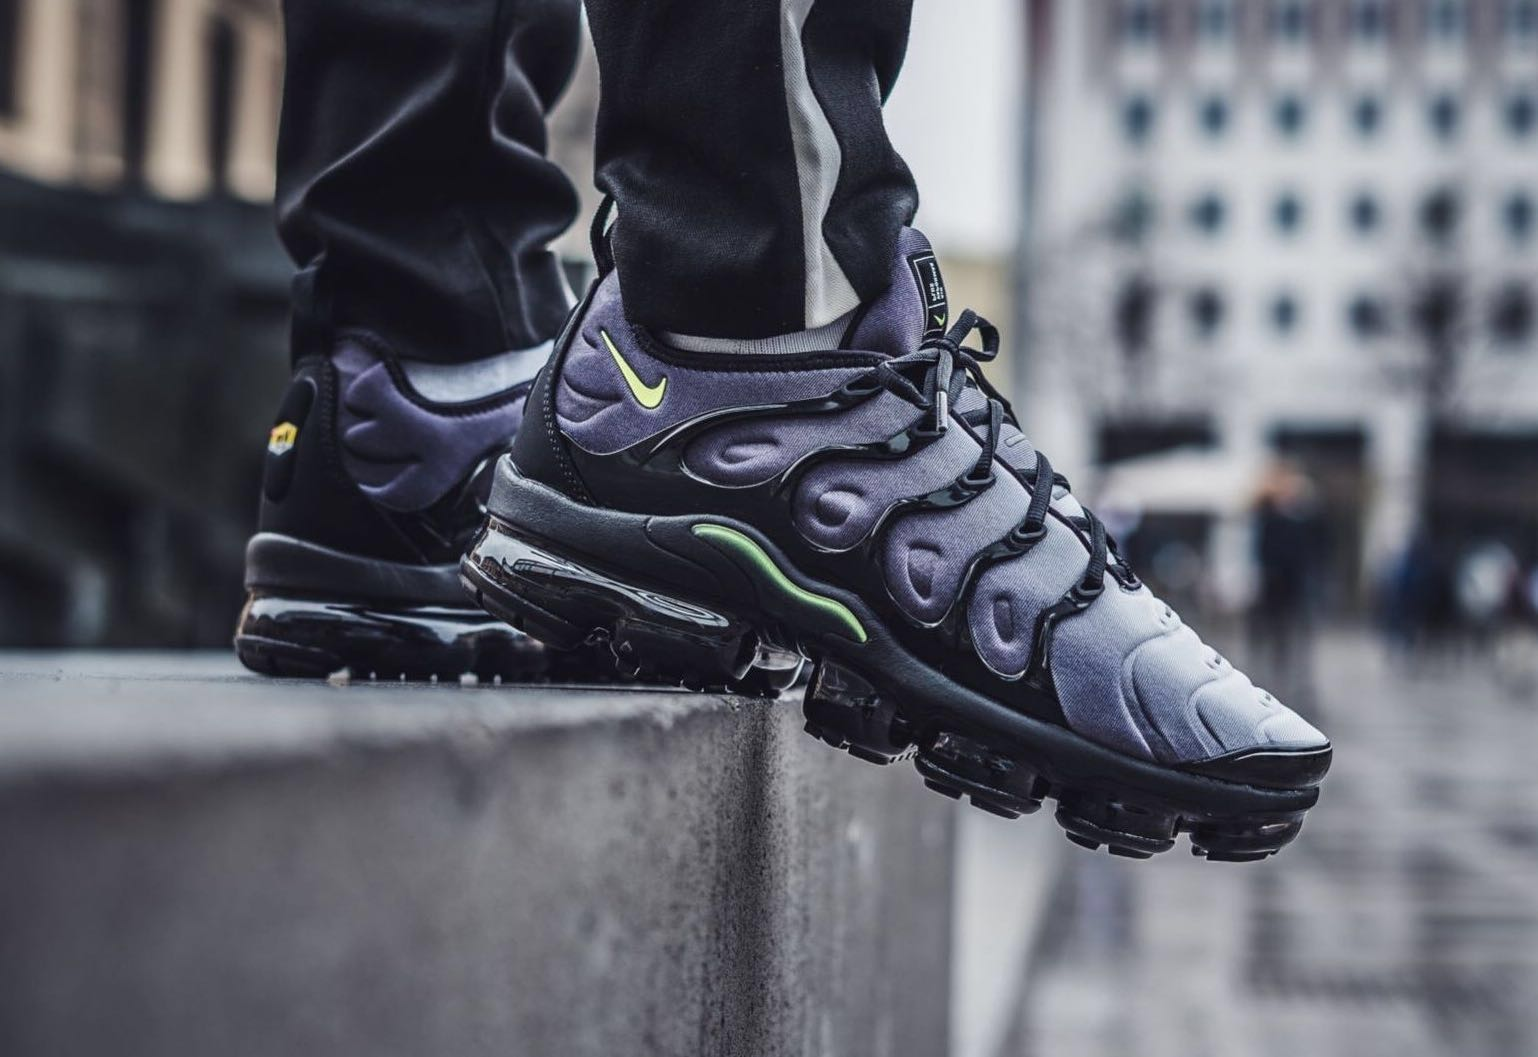 72bc22973b Nike Air VaporMax Plus Black Volt Neon, Men's Fashion, Watches on ...